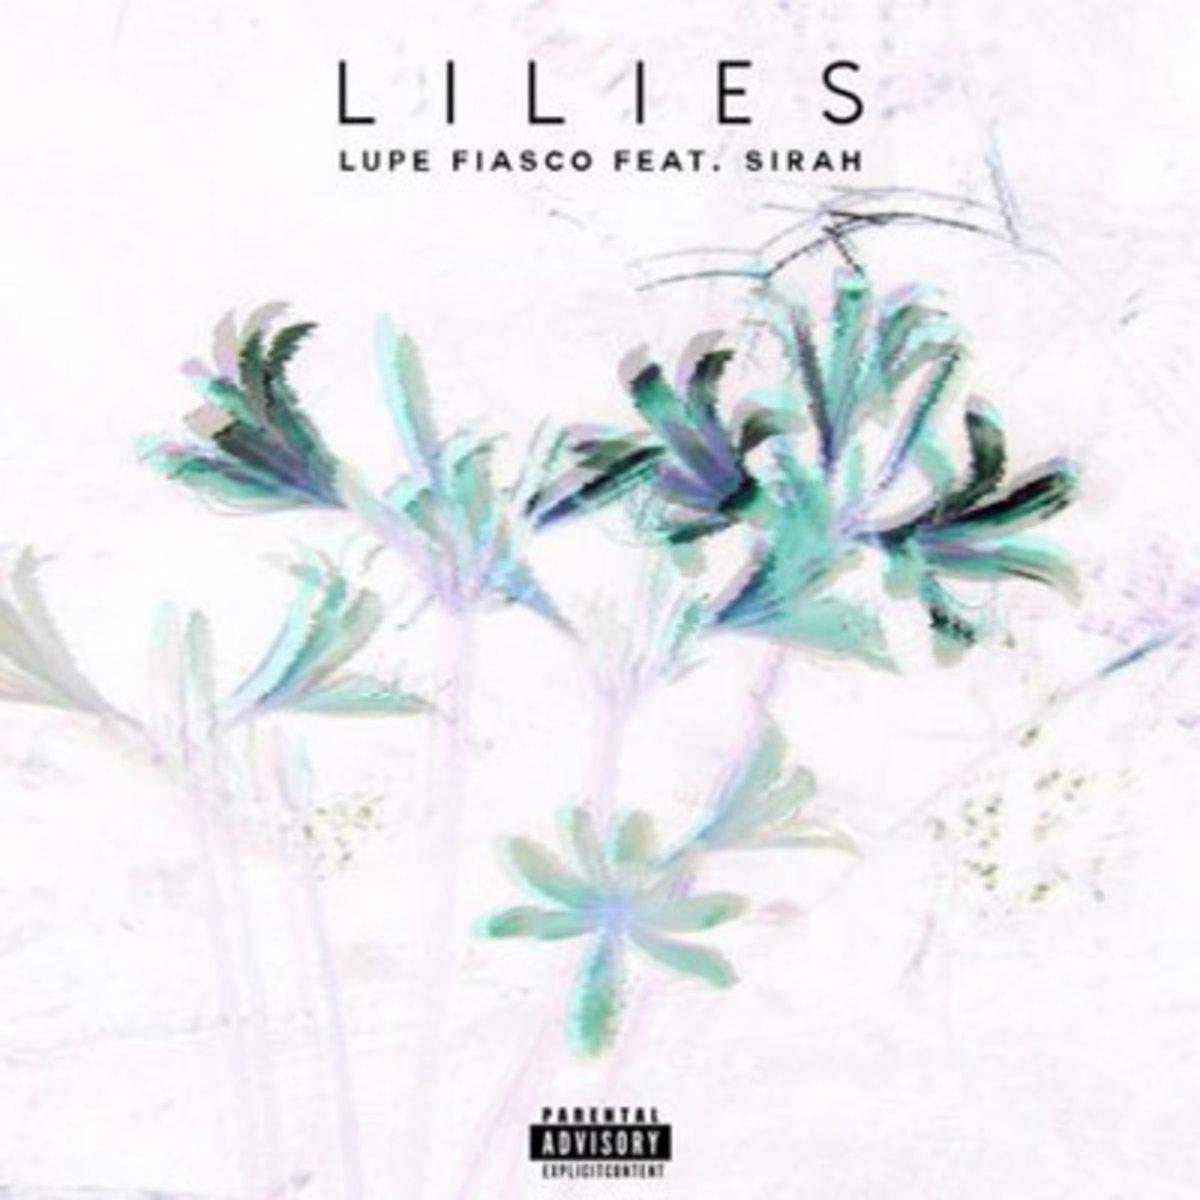 lupe-fiasco-lilies.jpg